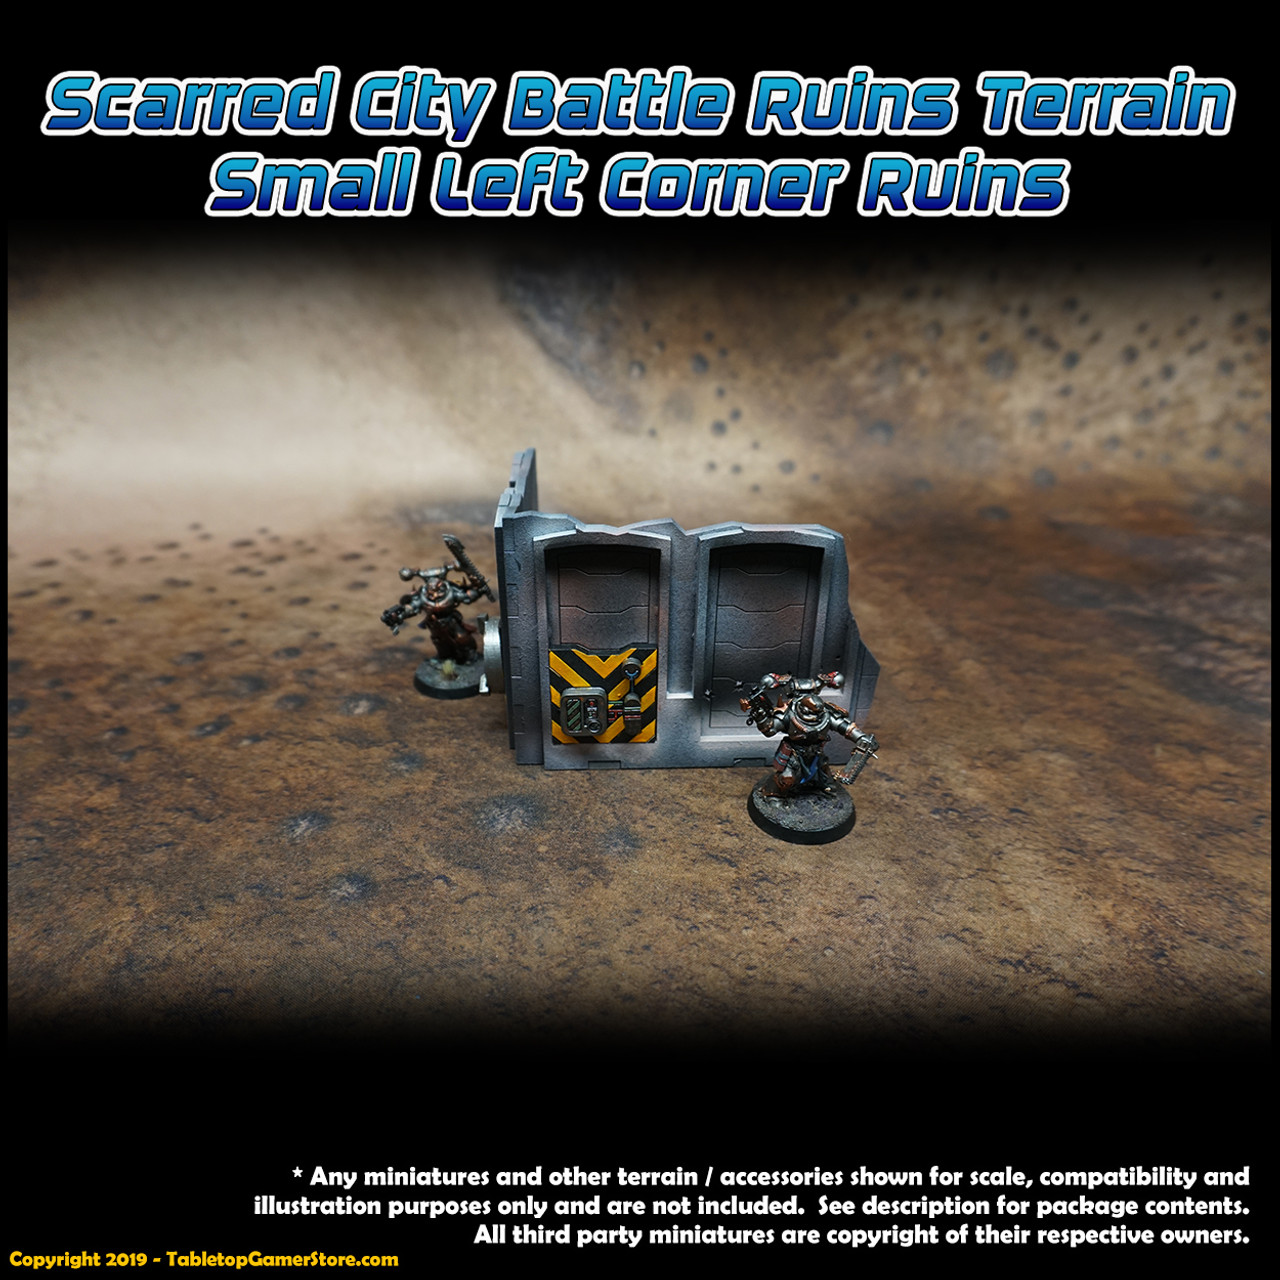 Scarred City Battle Ruins Terrain - Small Left Corner Ruins